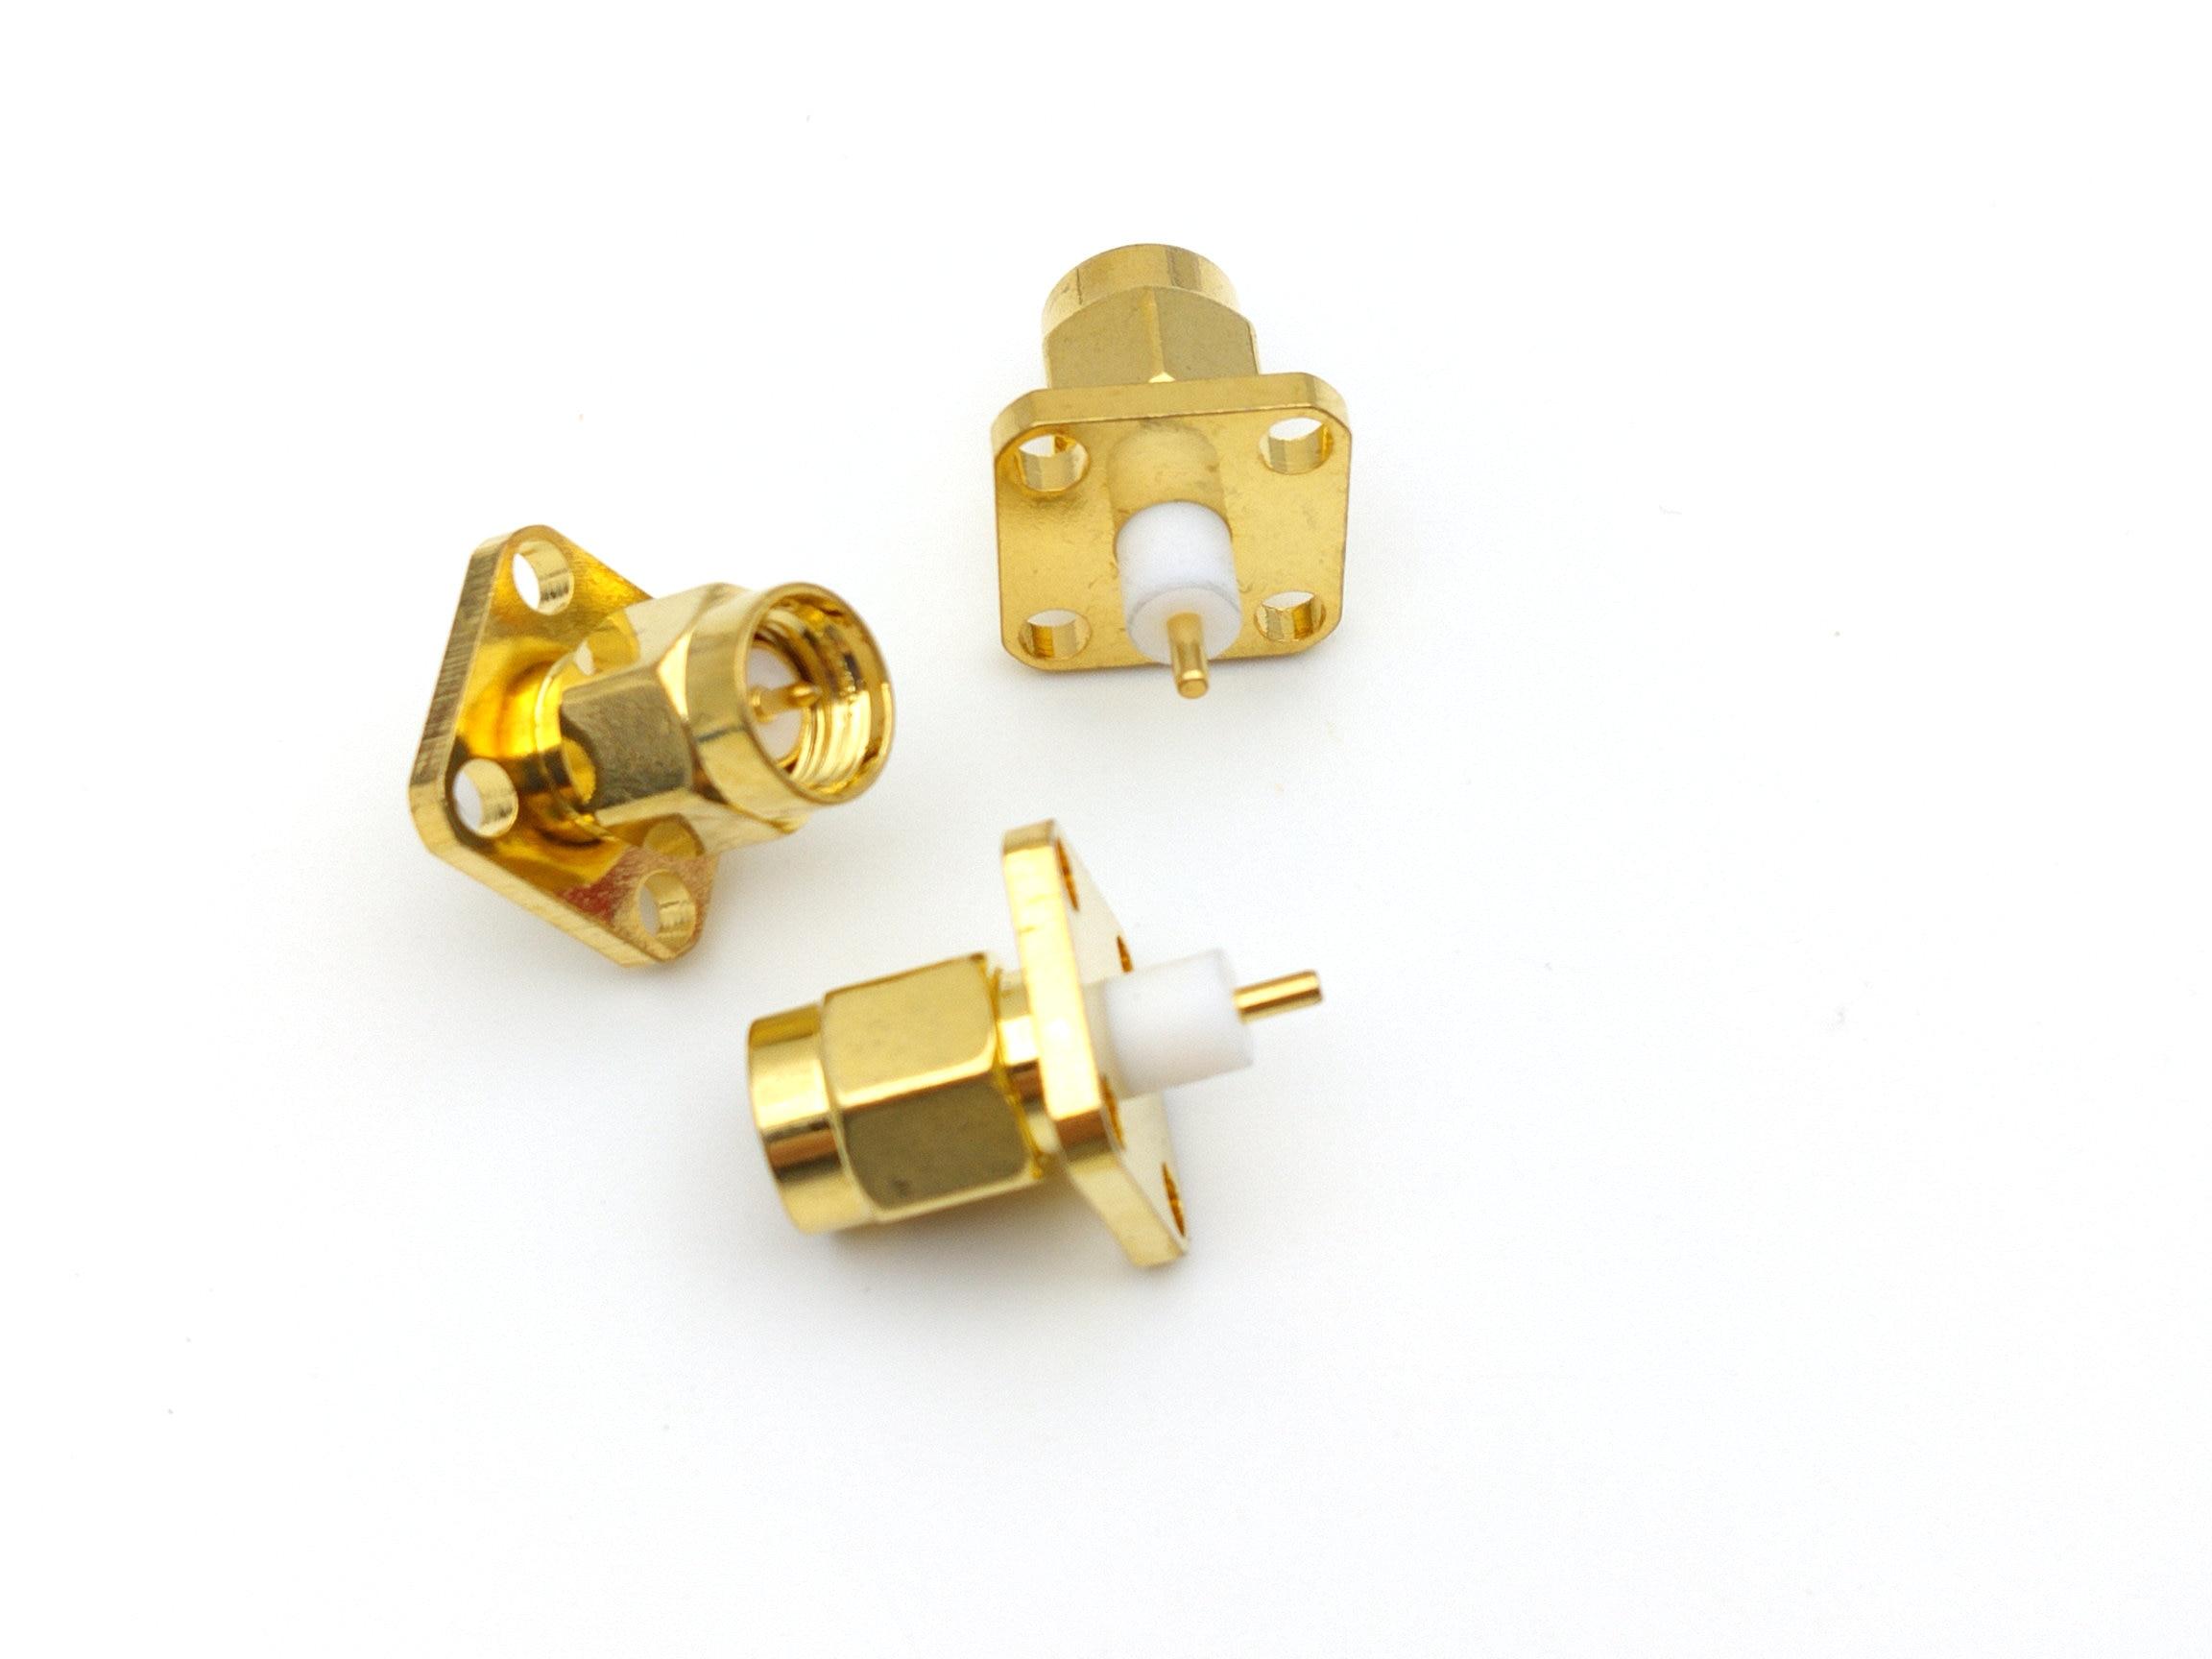 100 pcs sma plugue macho 4 buraco panel mount curto dieletrica e solda pos conectores rf